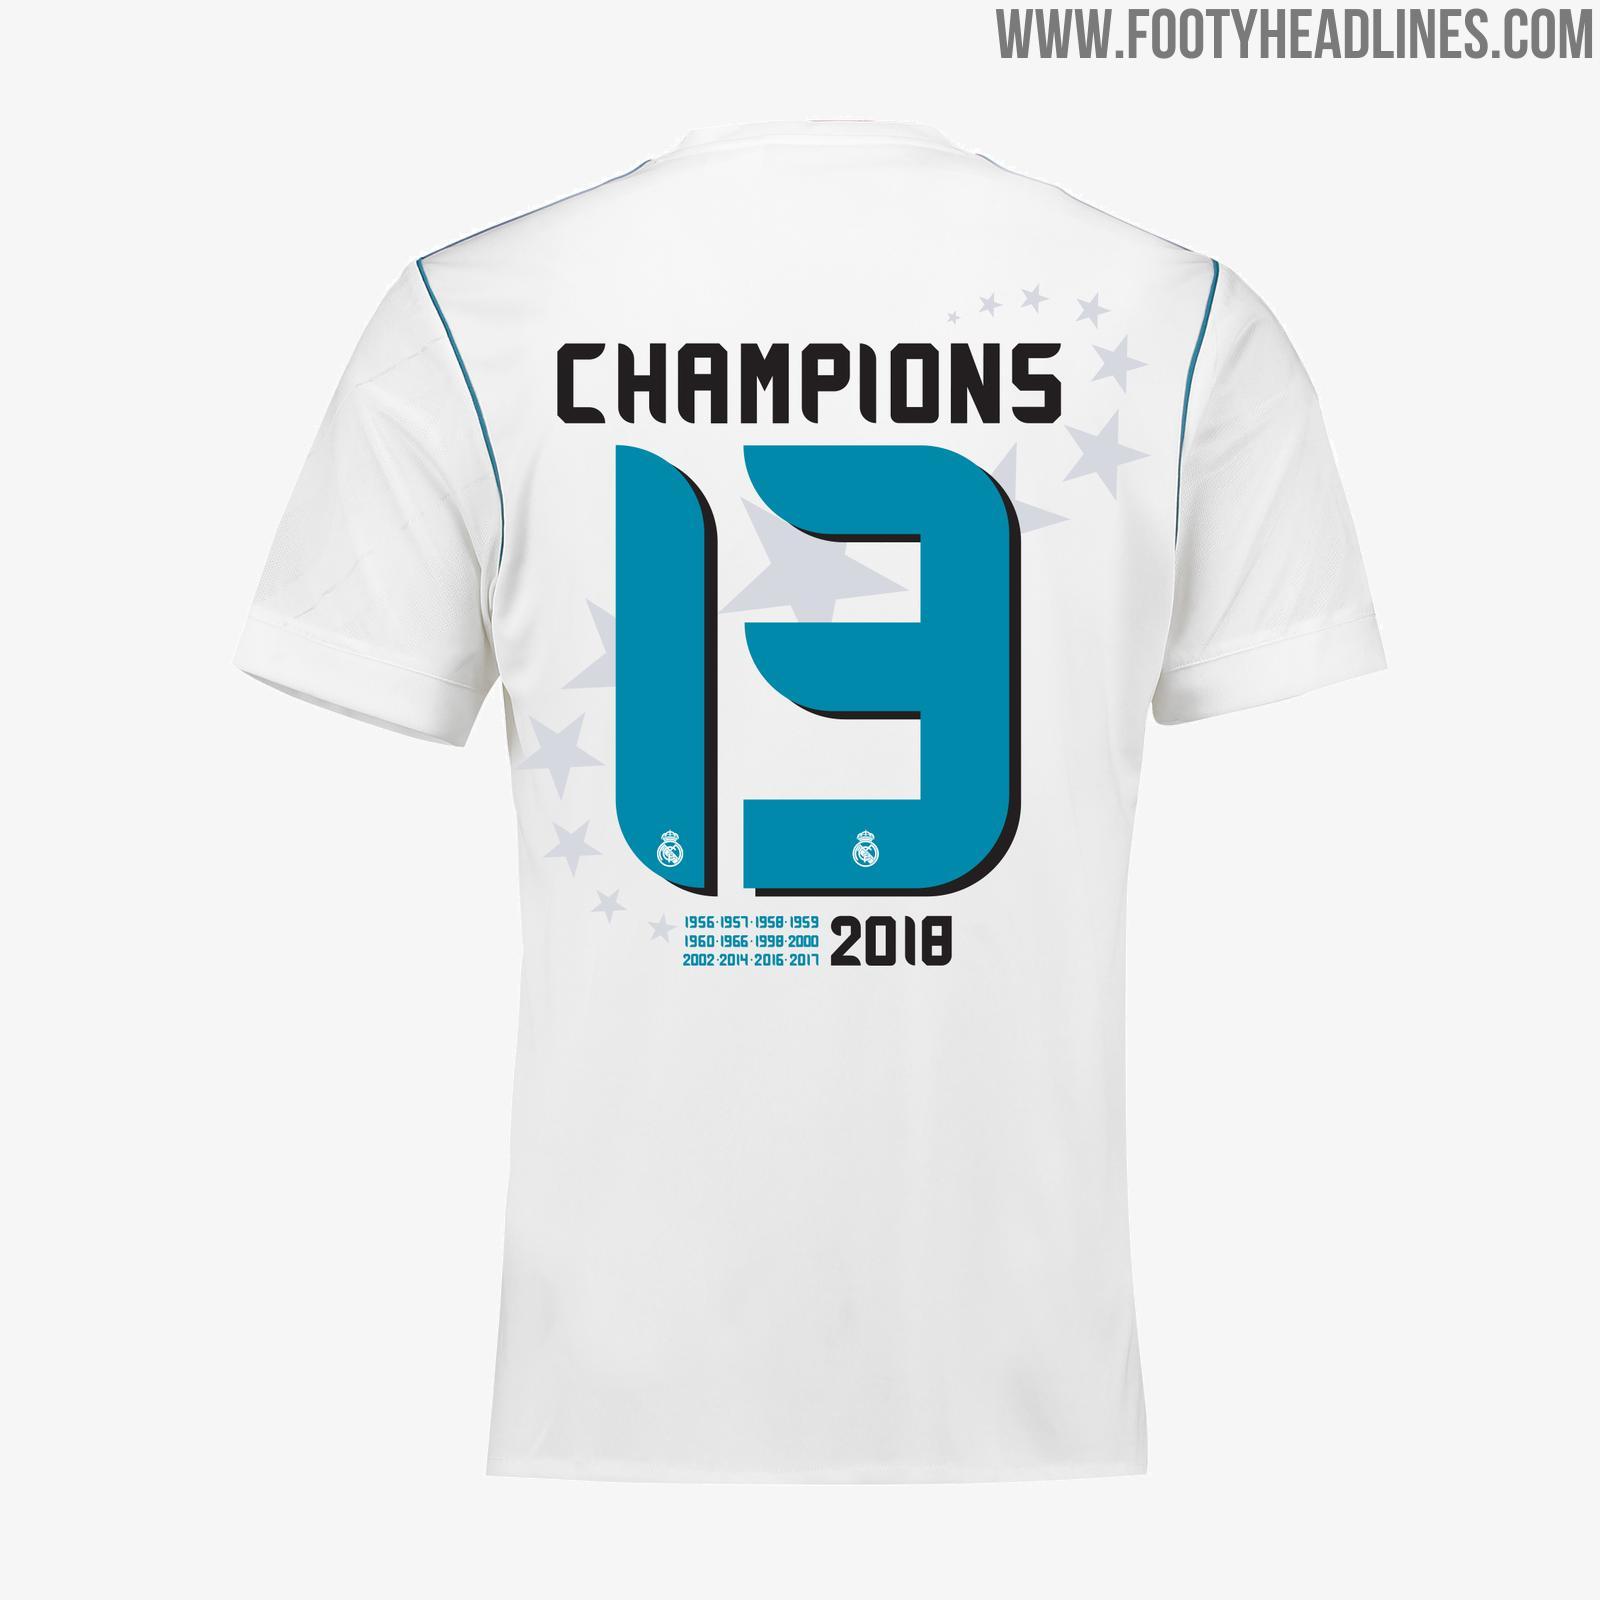 buy online 758c6 c7298 Real Madrid Champions League Polo Shirt | RLDM